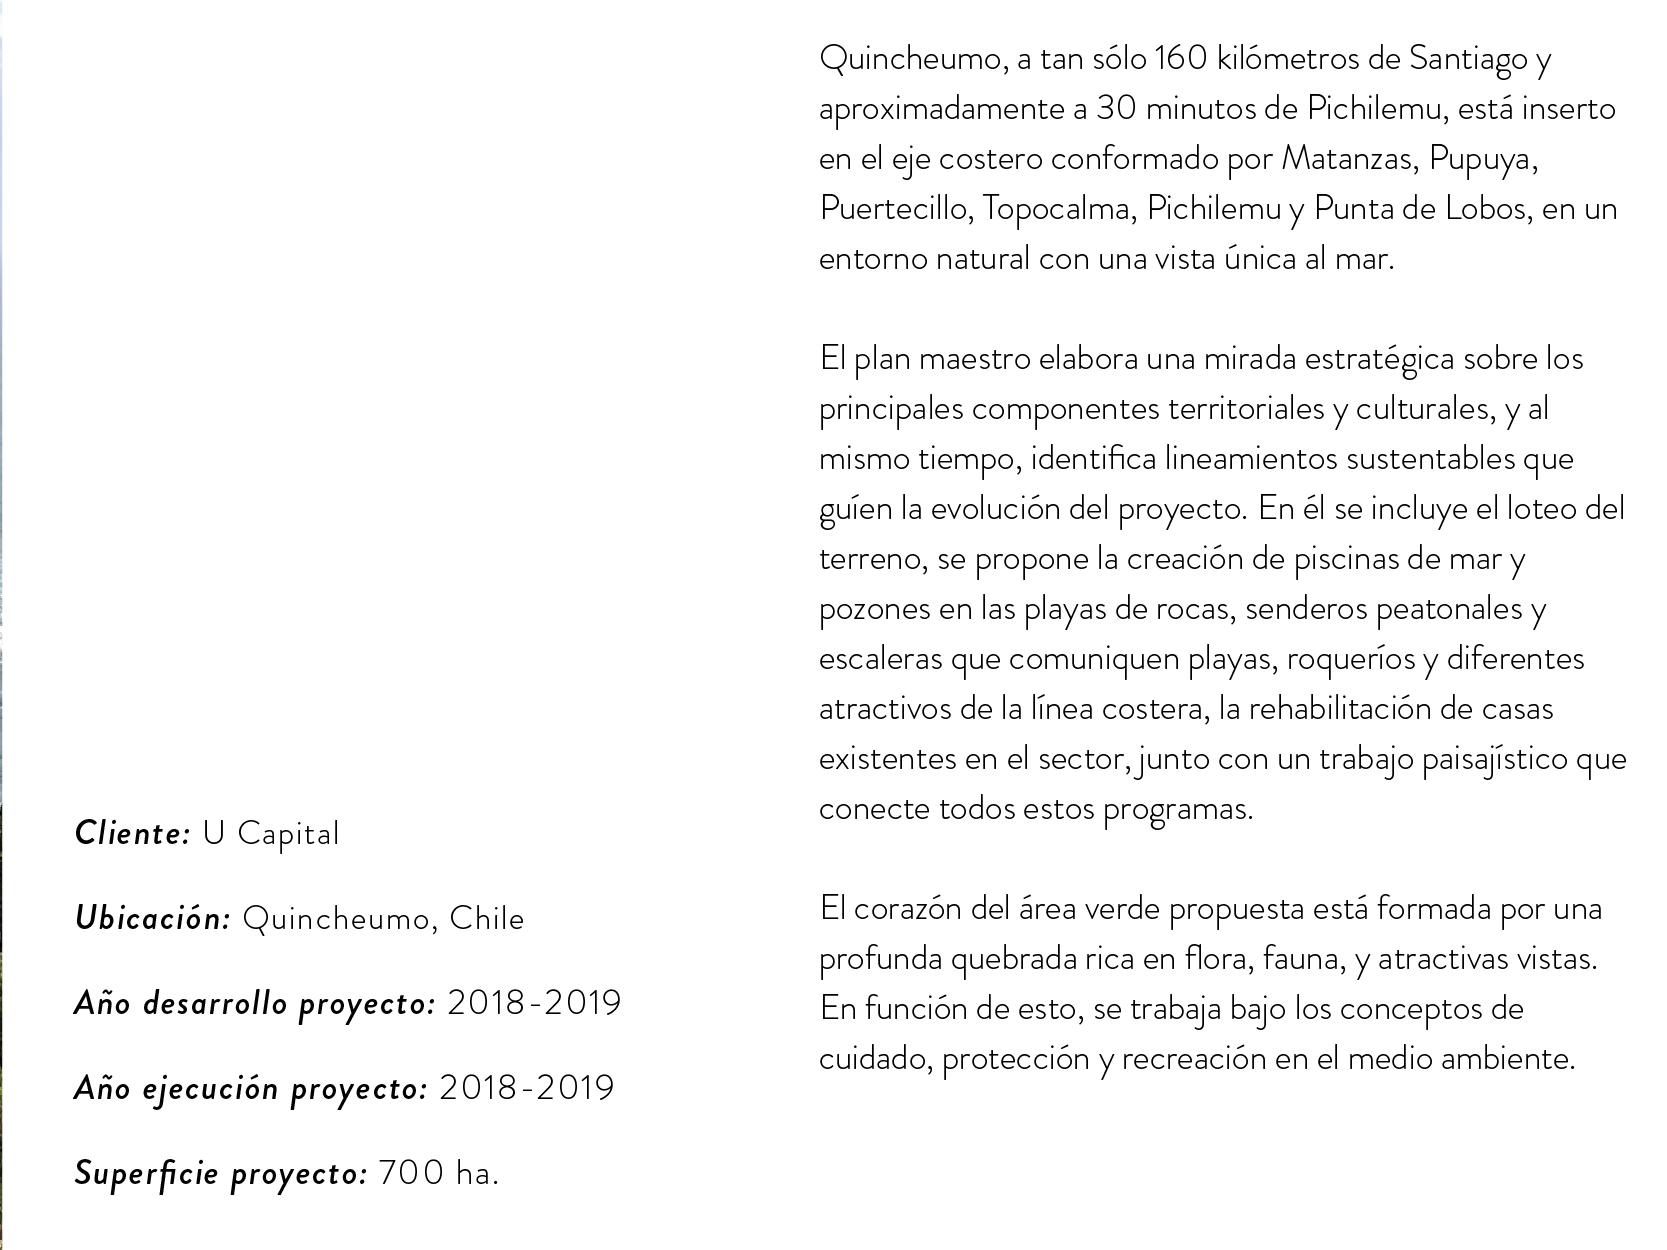 Formato Panoramico Quincheumo-02.jpg